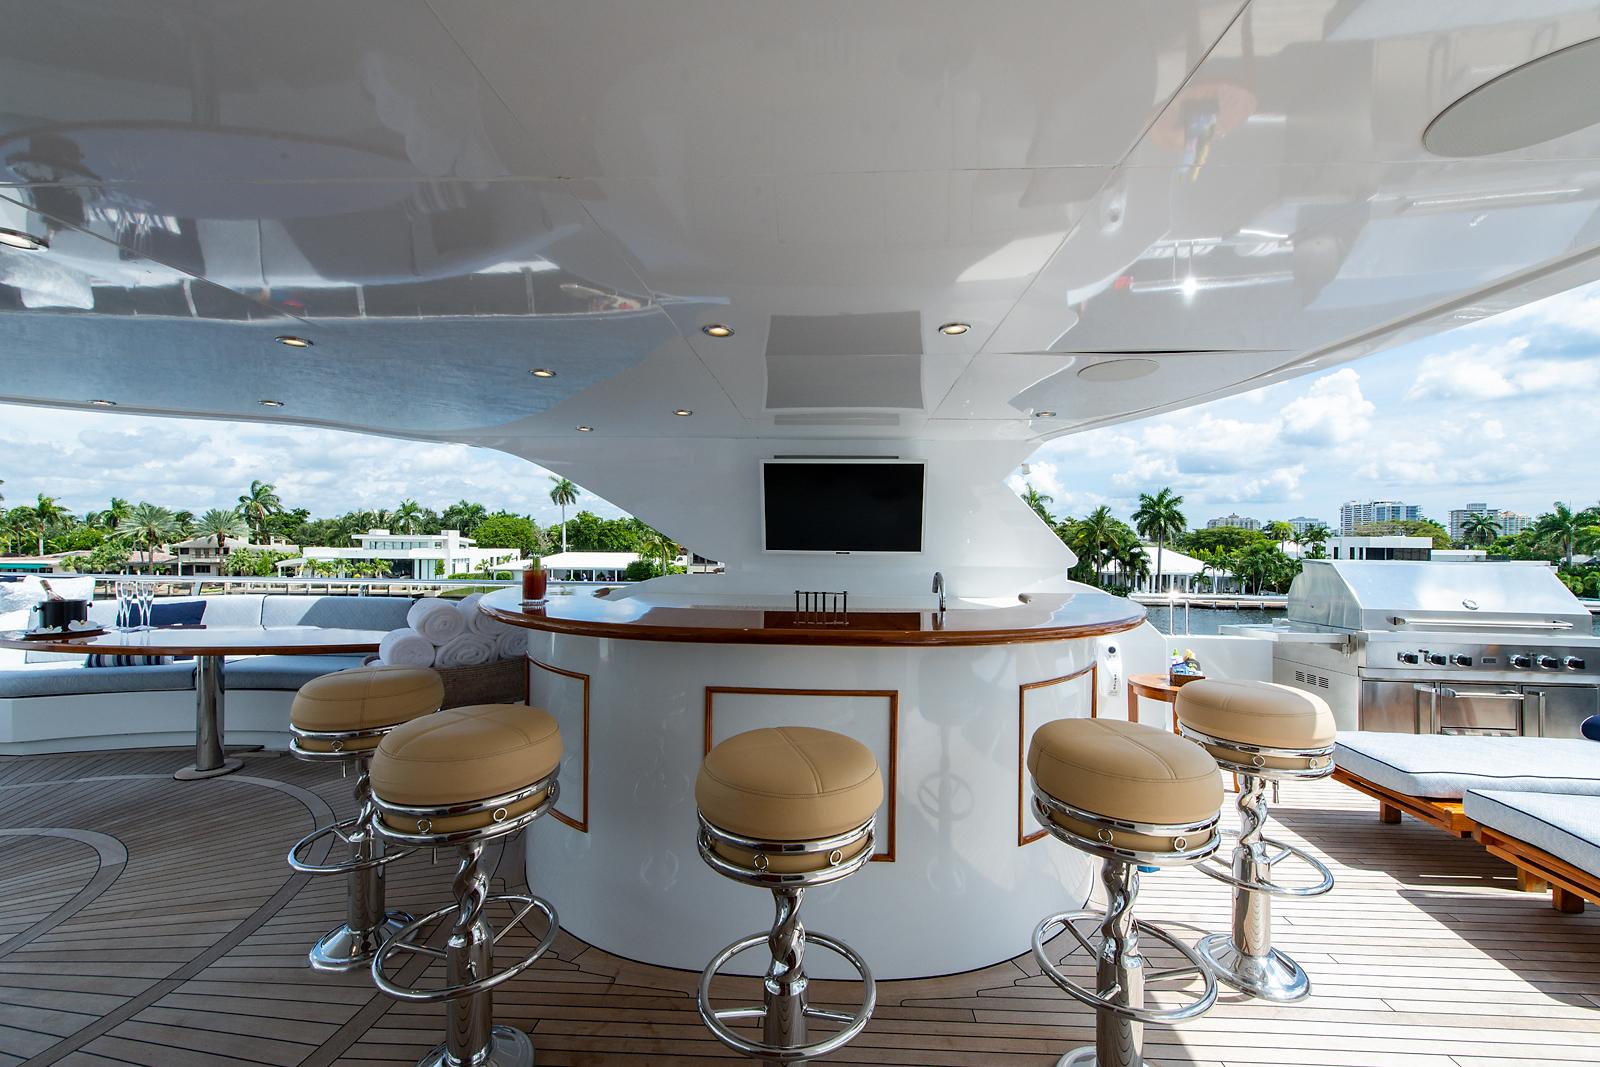 Sun Deck Bar Area